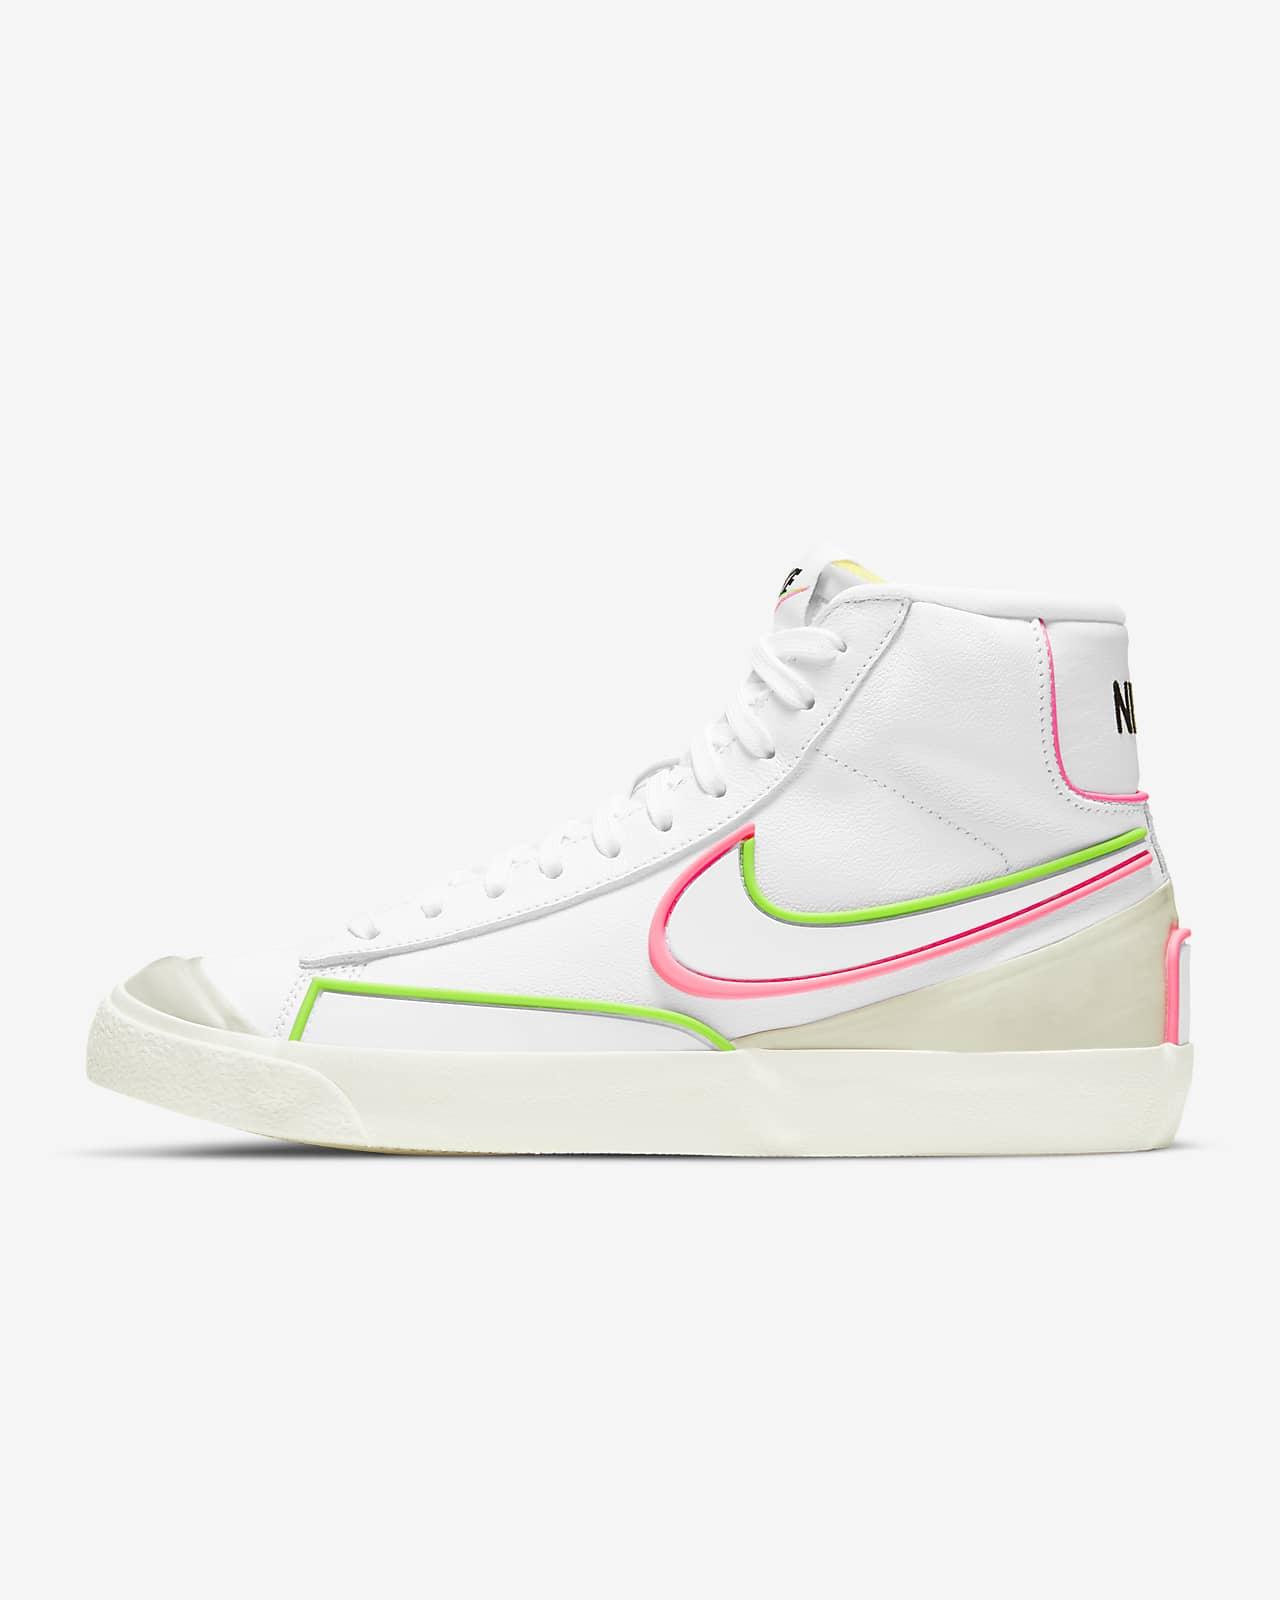 Nike Blazer 中筒 '77 Infinite 女鞋